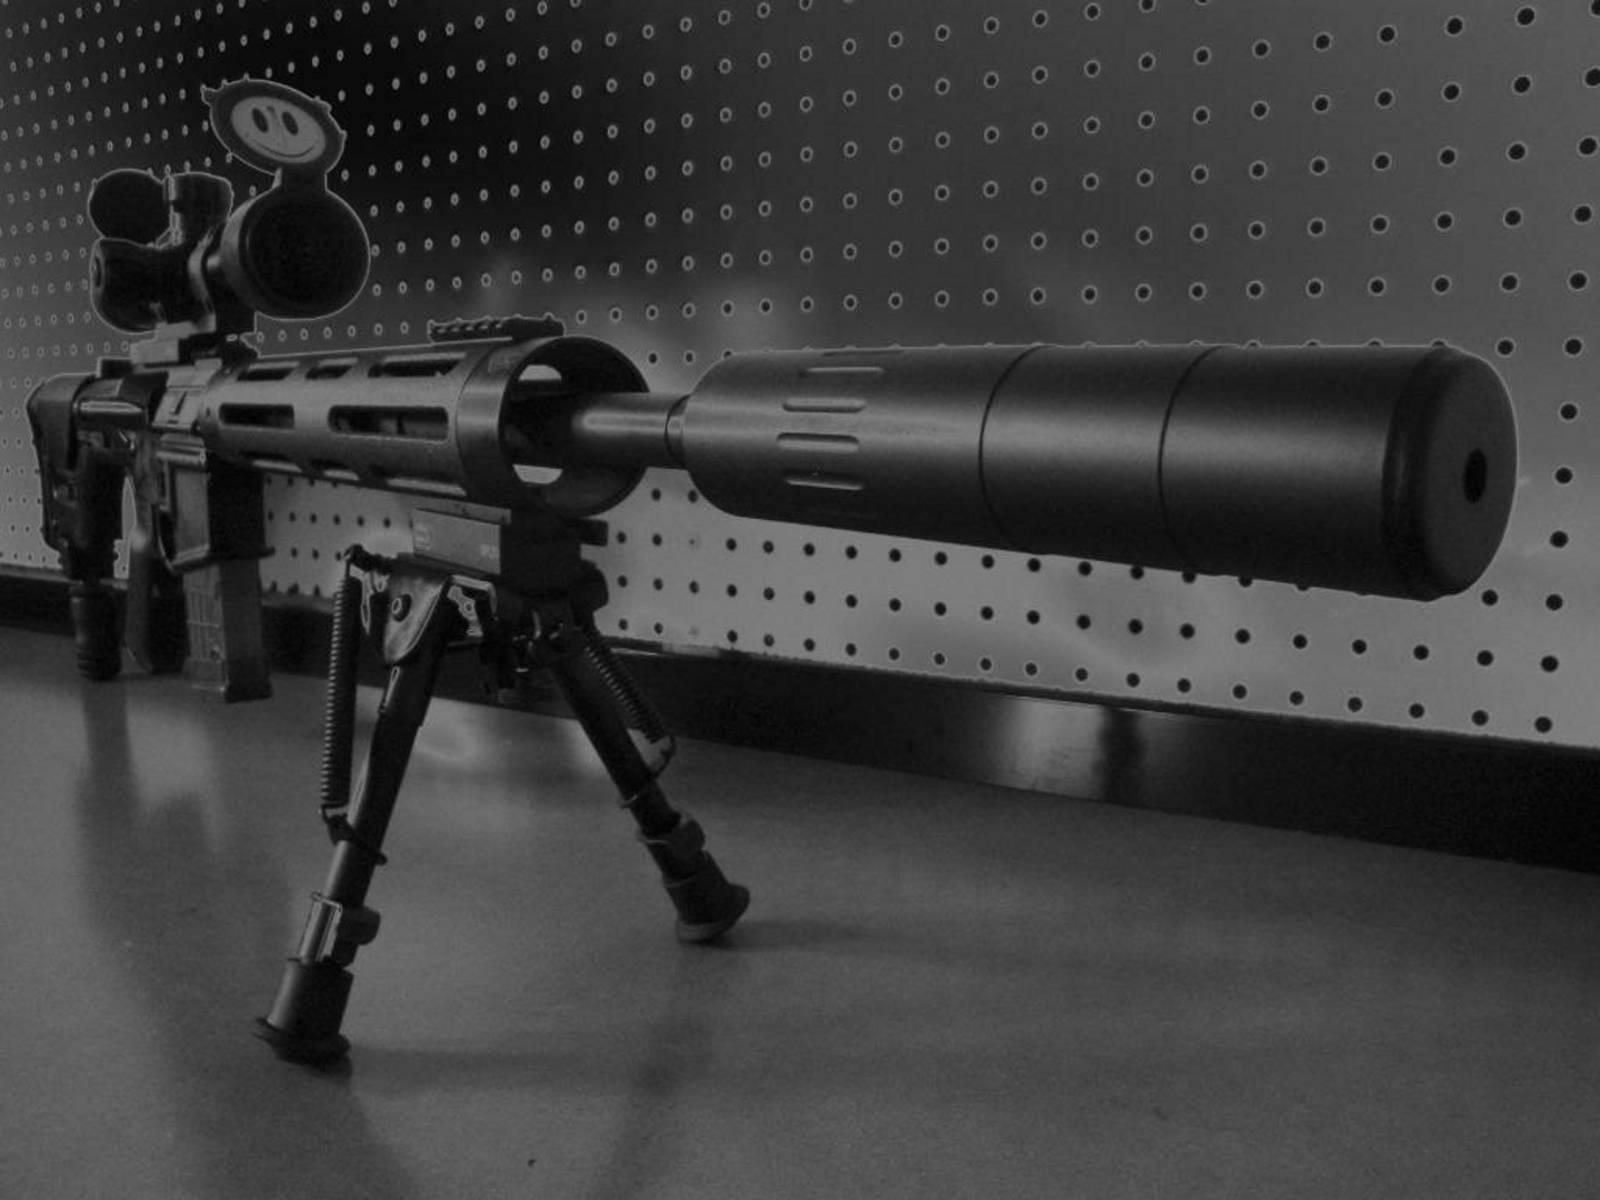 [76+] Sniper Rifle Wallpaper on WallpaperSafari